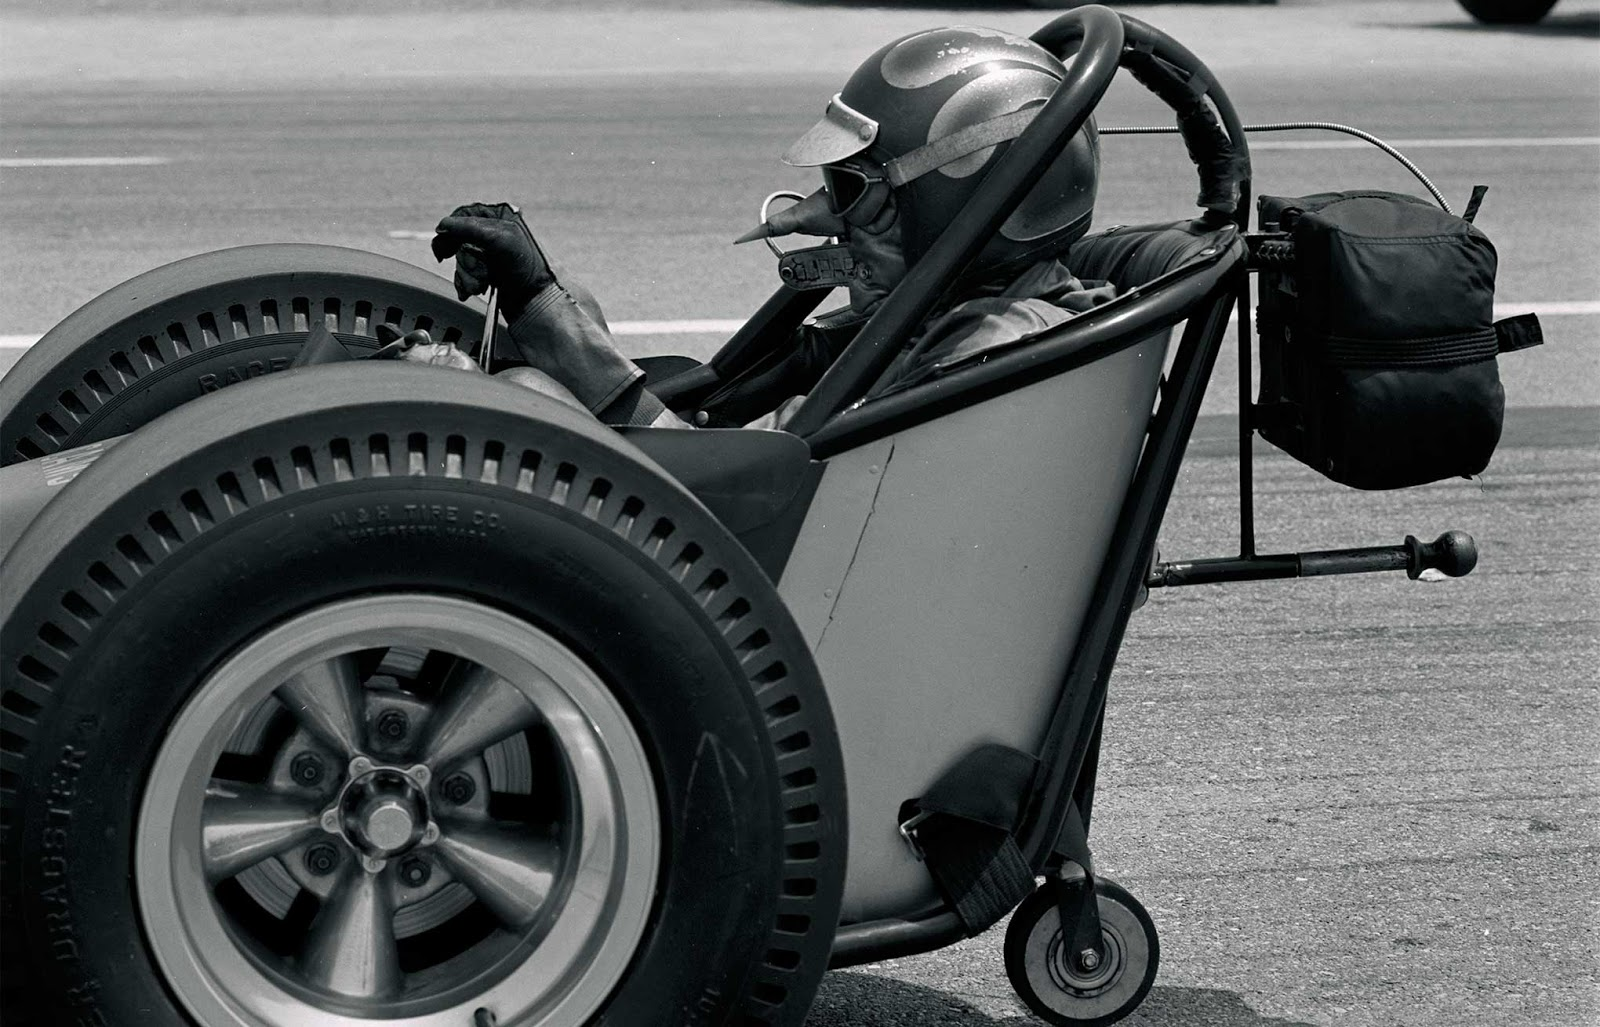 Http://www.hotrod.com/articles/nascar Bans 426 Hemi Sohc Ford  Launch Wild 1965 Racing Season/